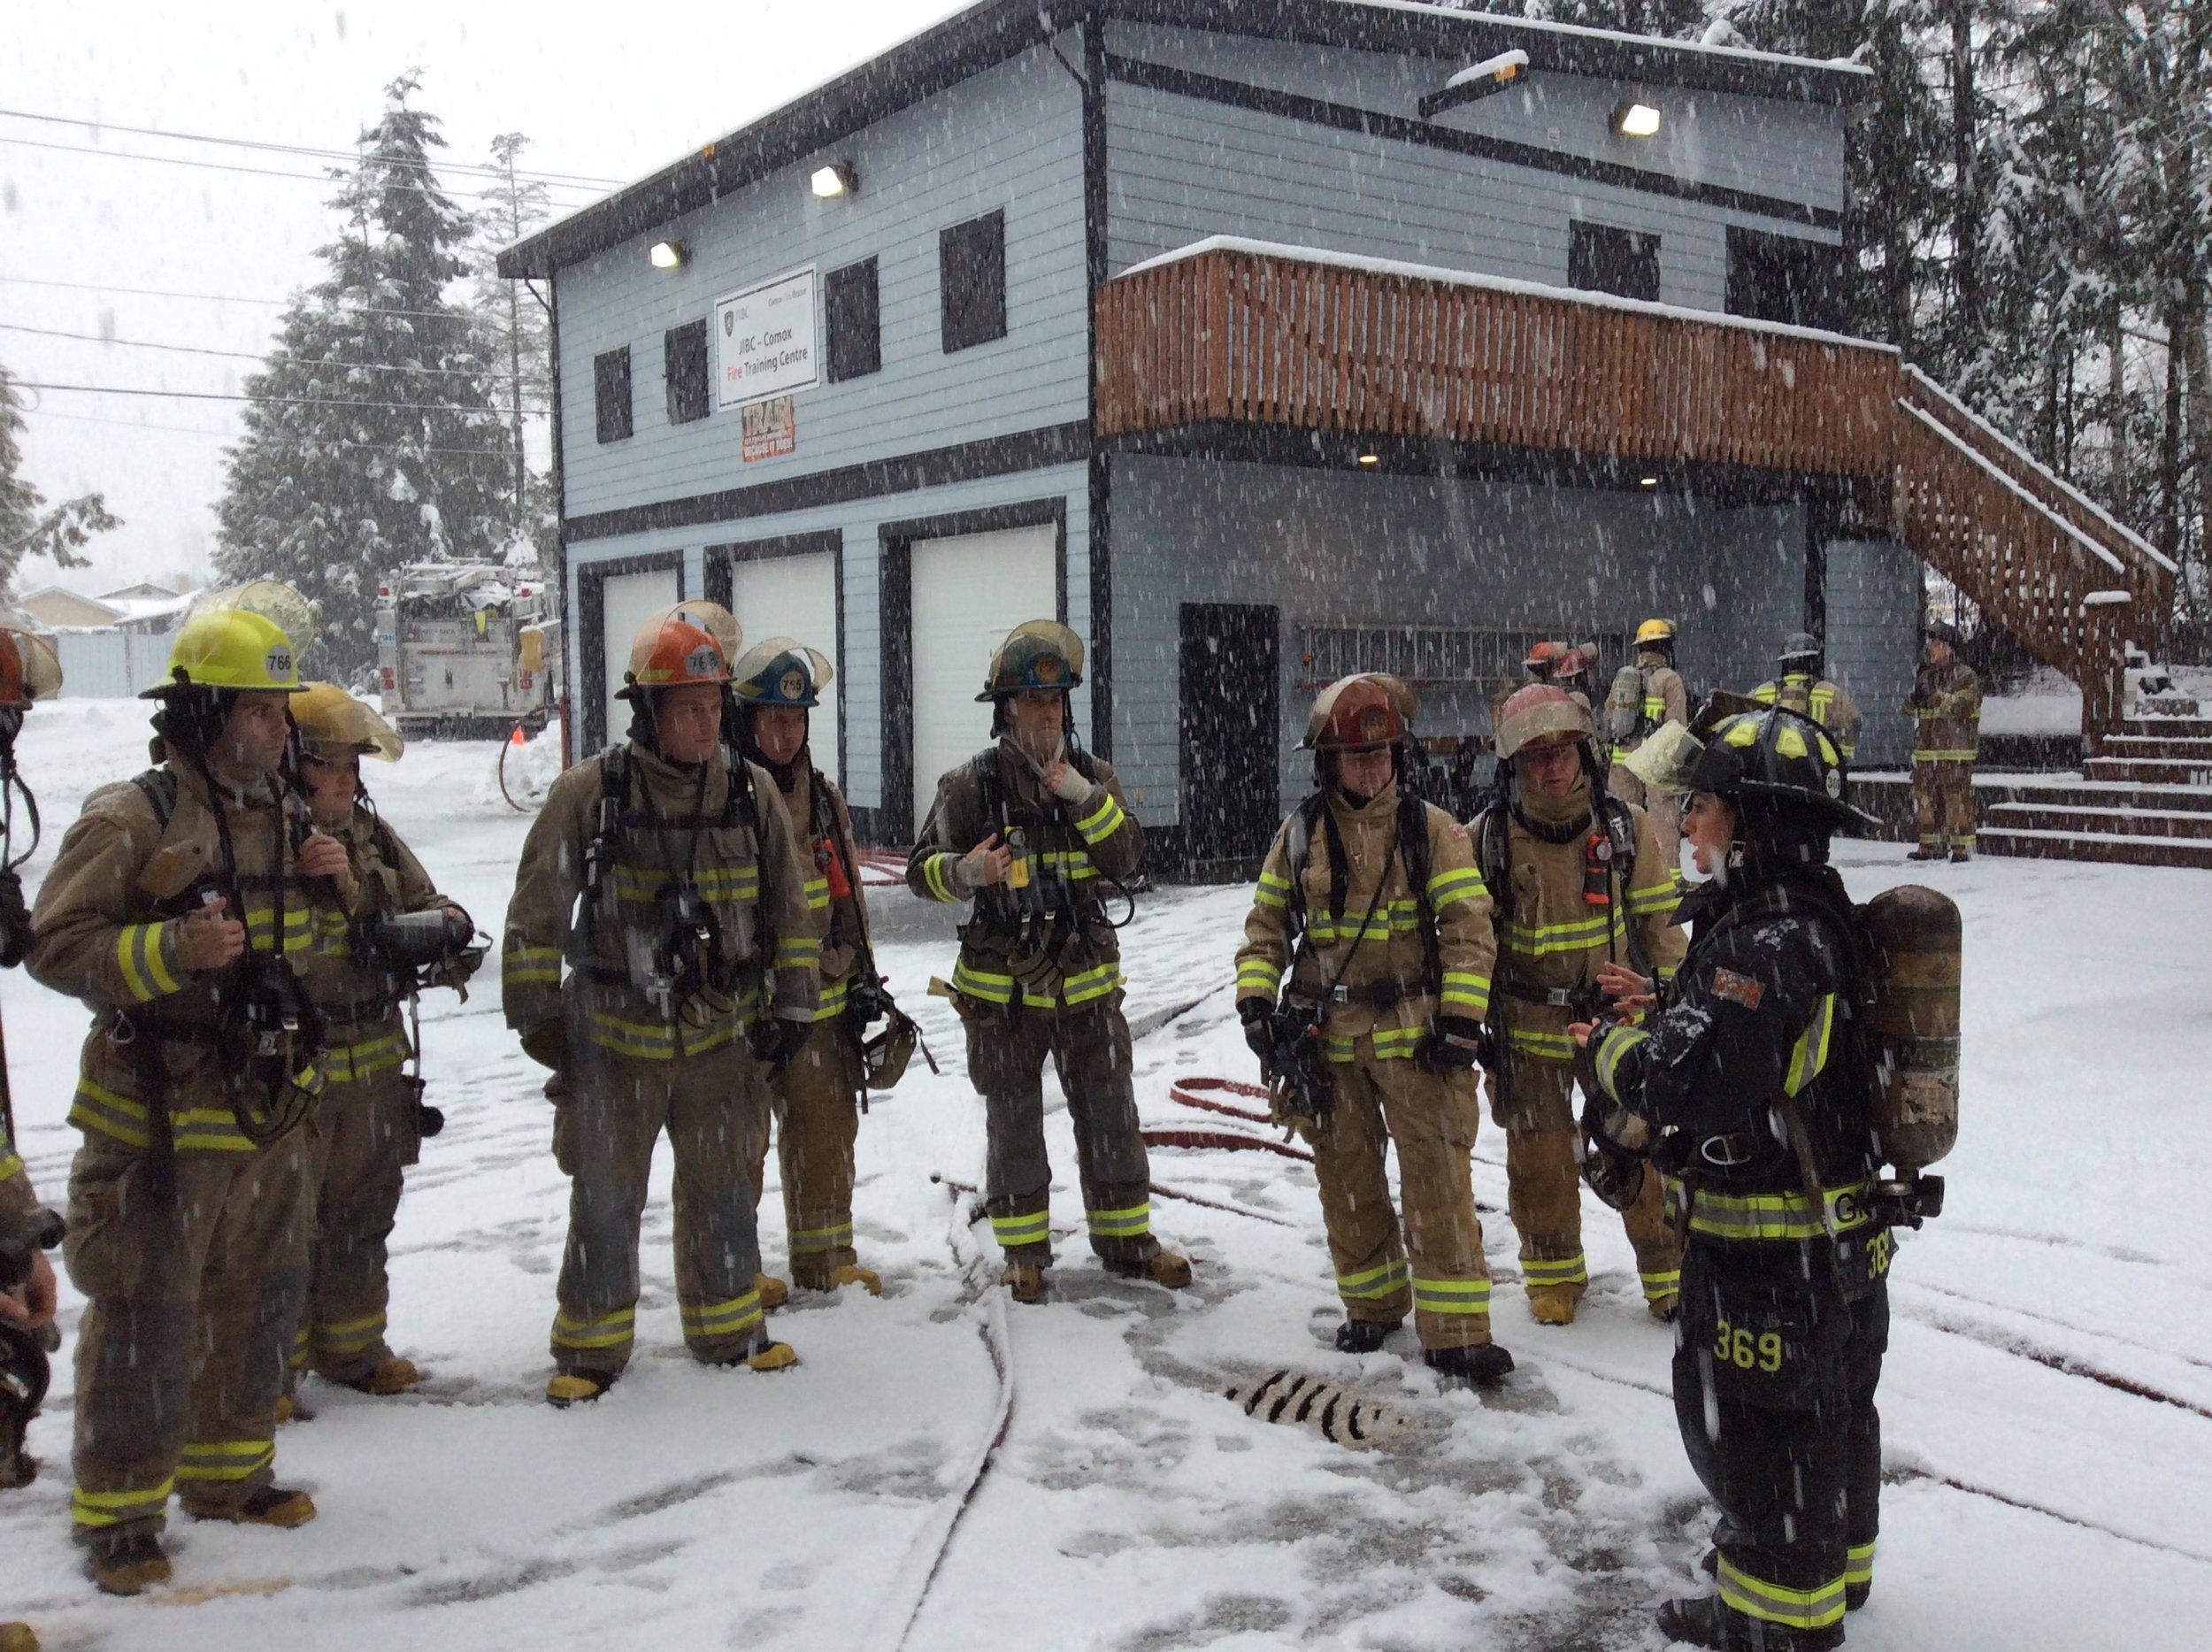 Fire Attack in the snow!